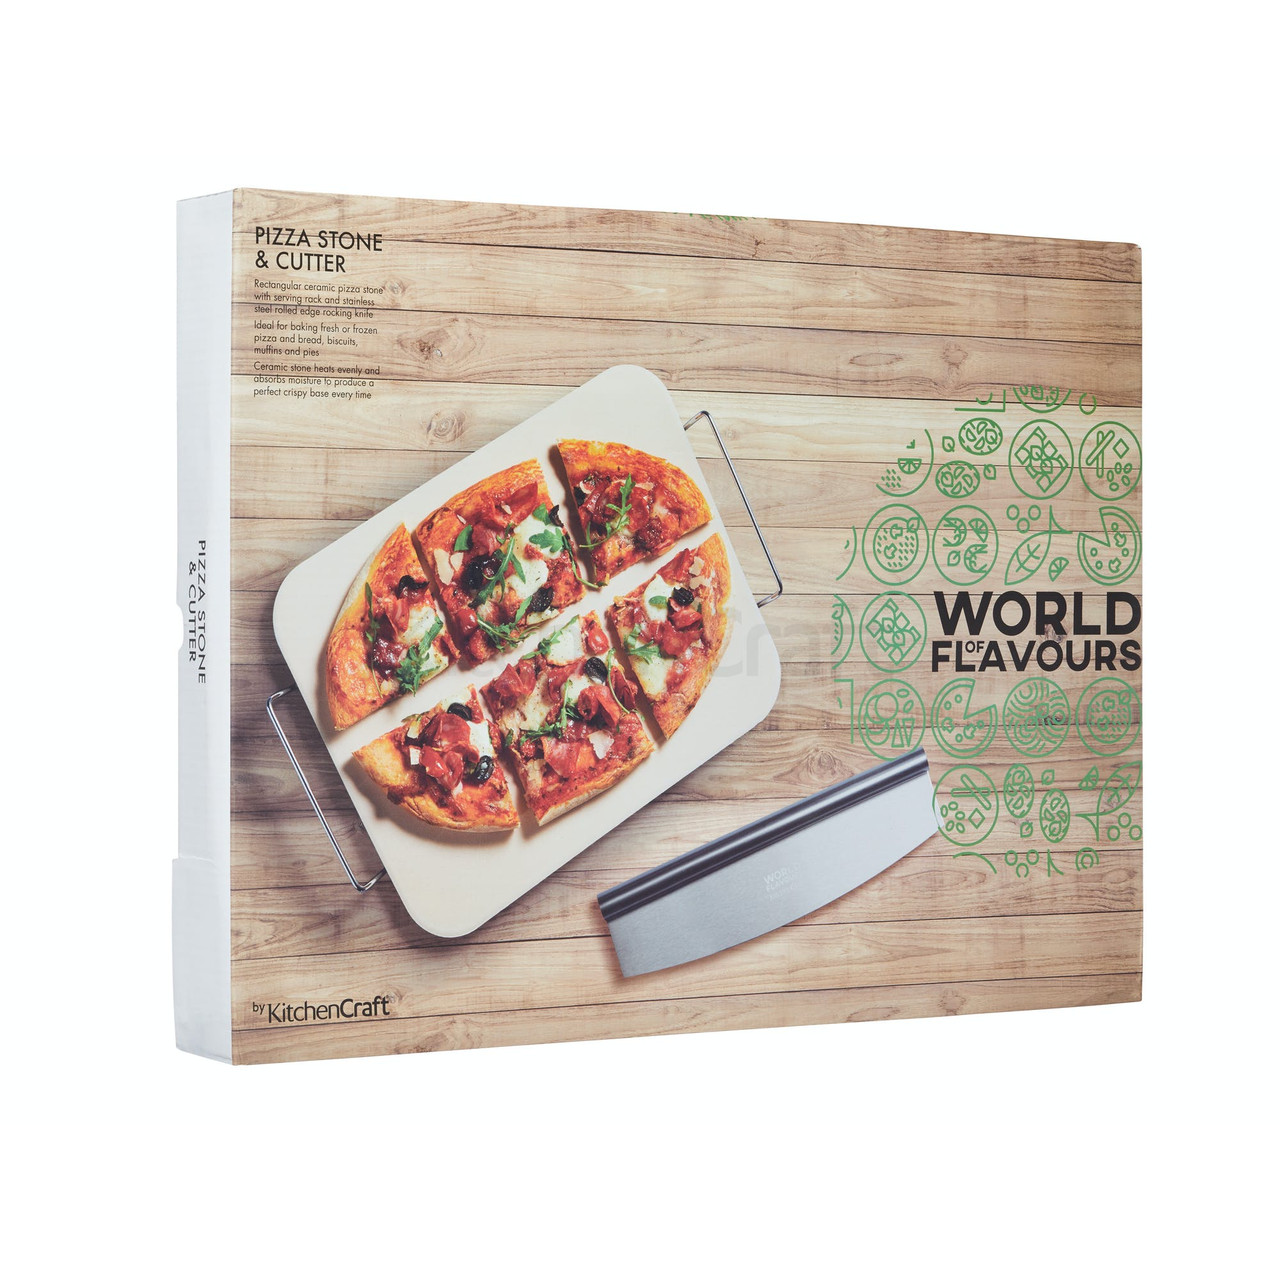 ITALIAN LARGE PIZZA STONE & CUTTER